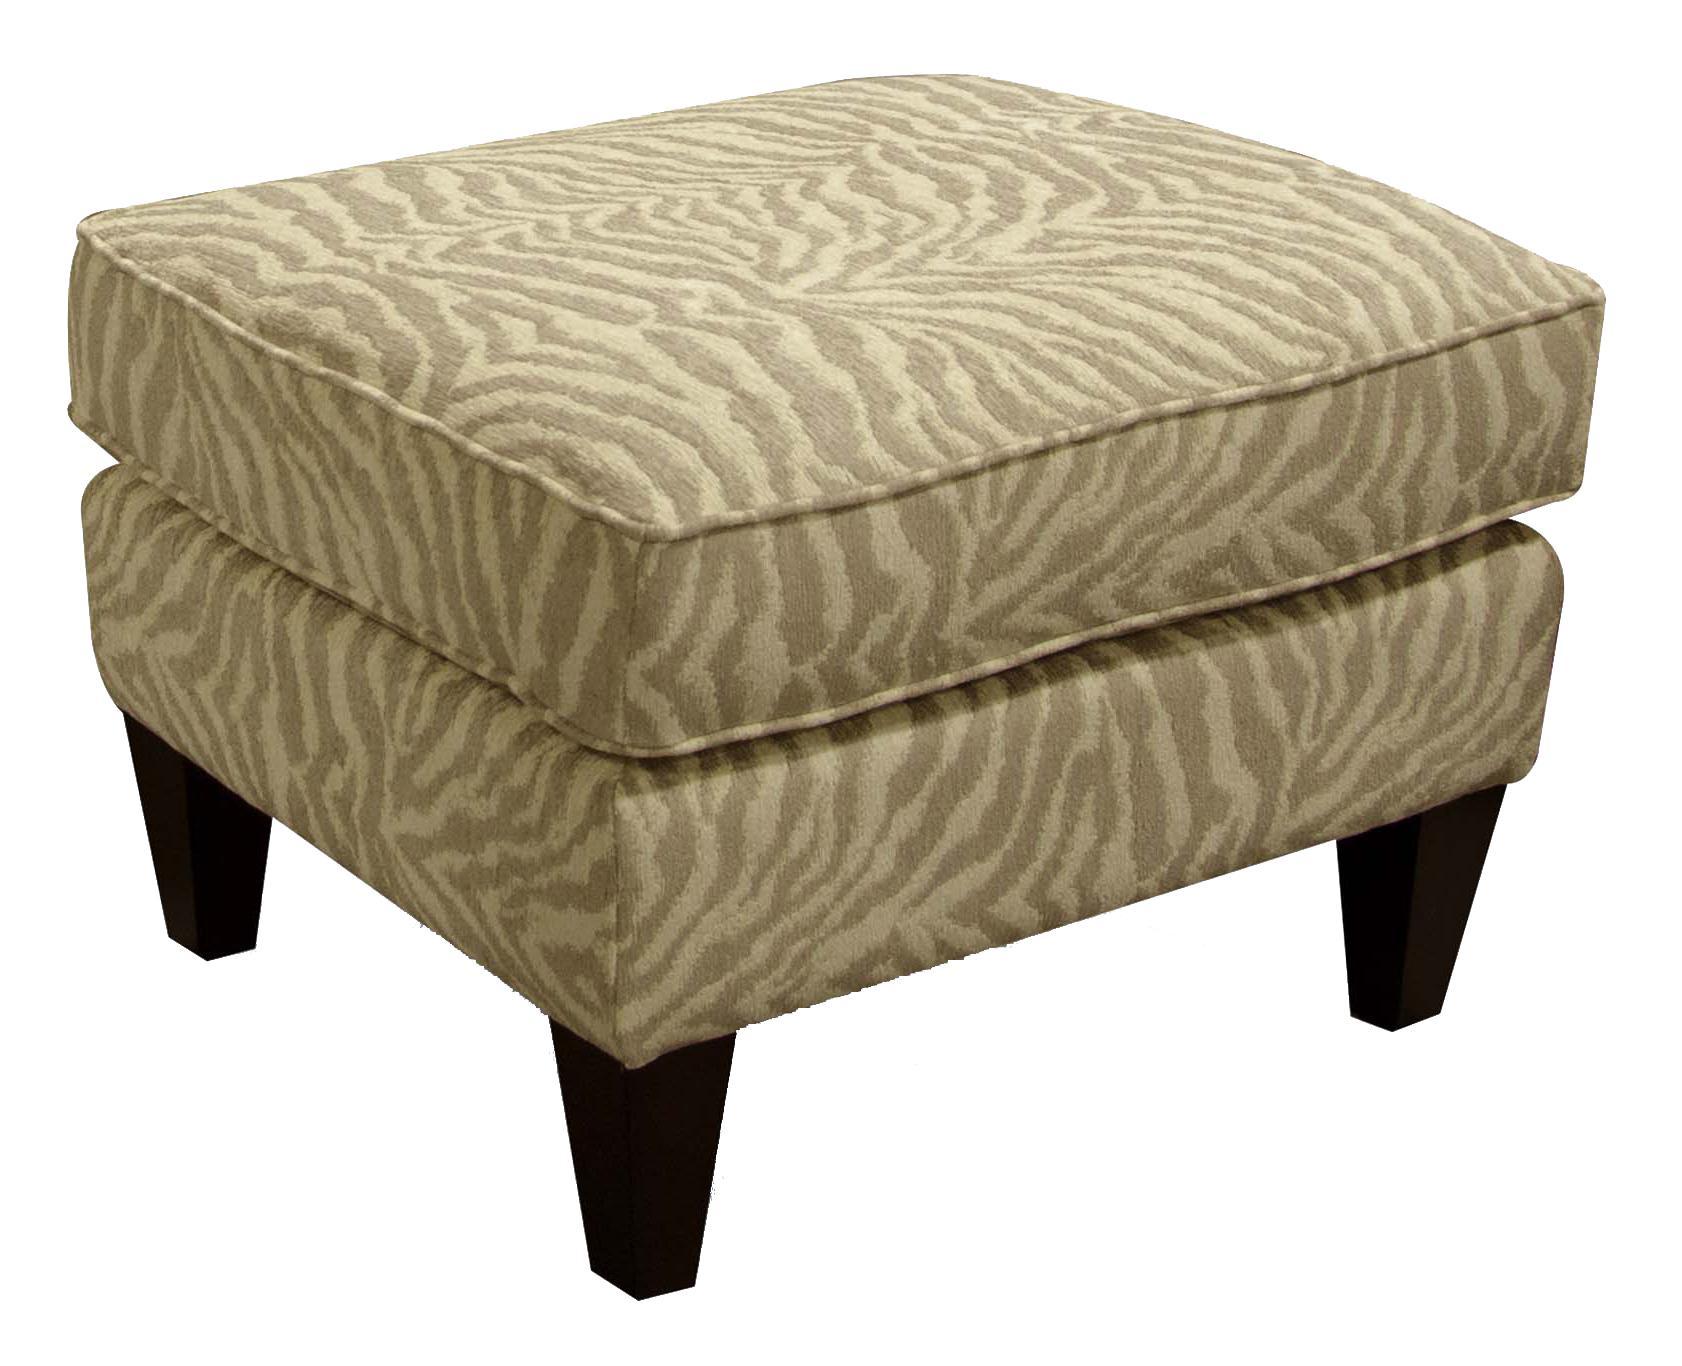 England Duke Living Room Ottoman - Item Number: 3137